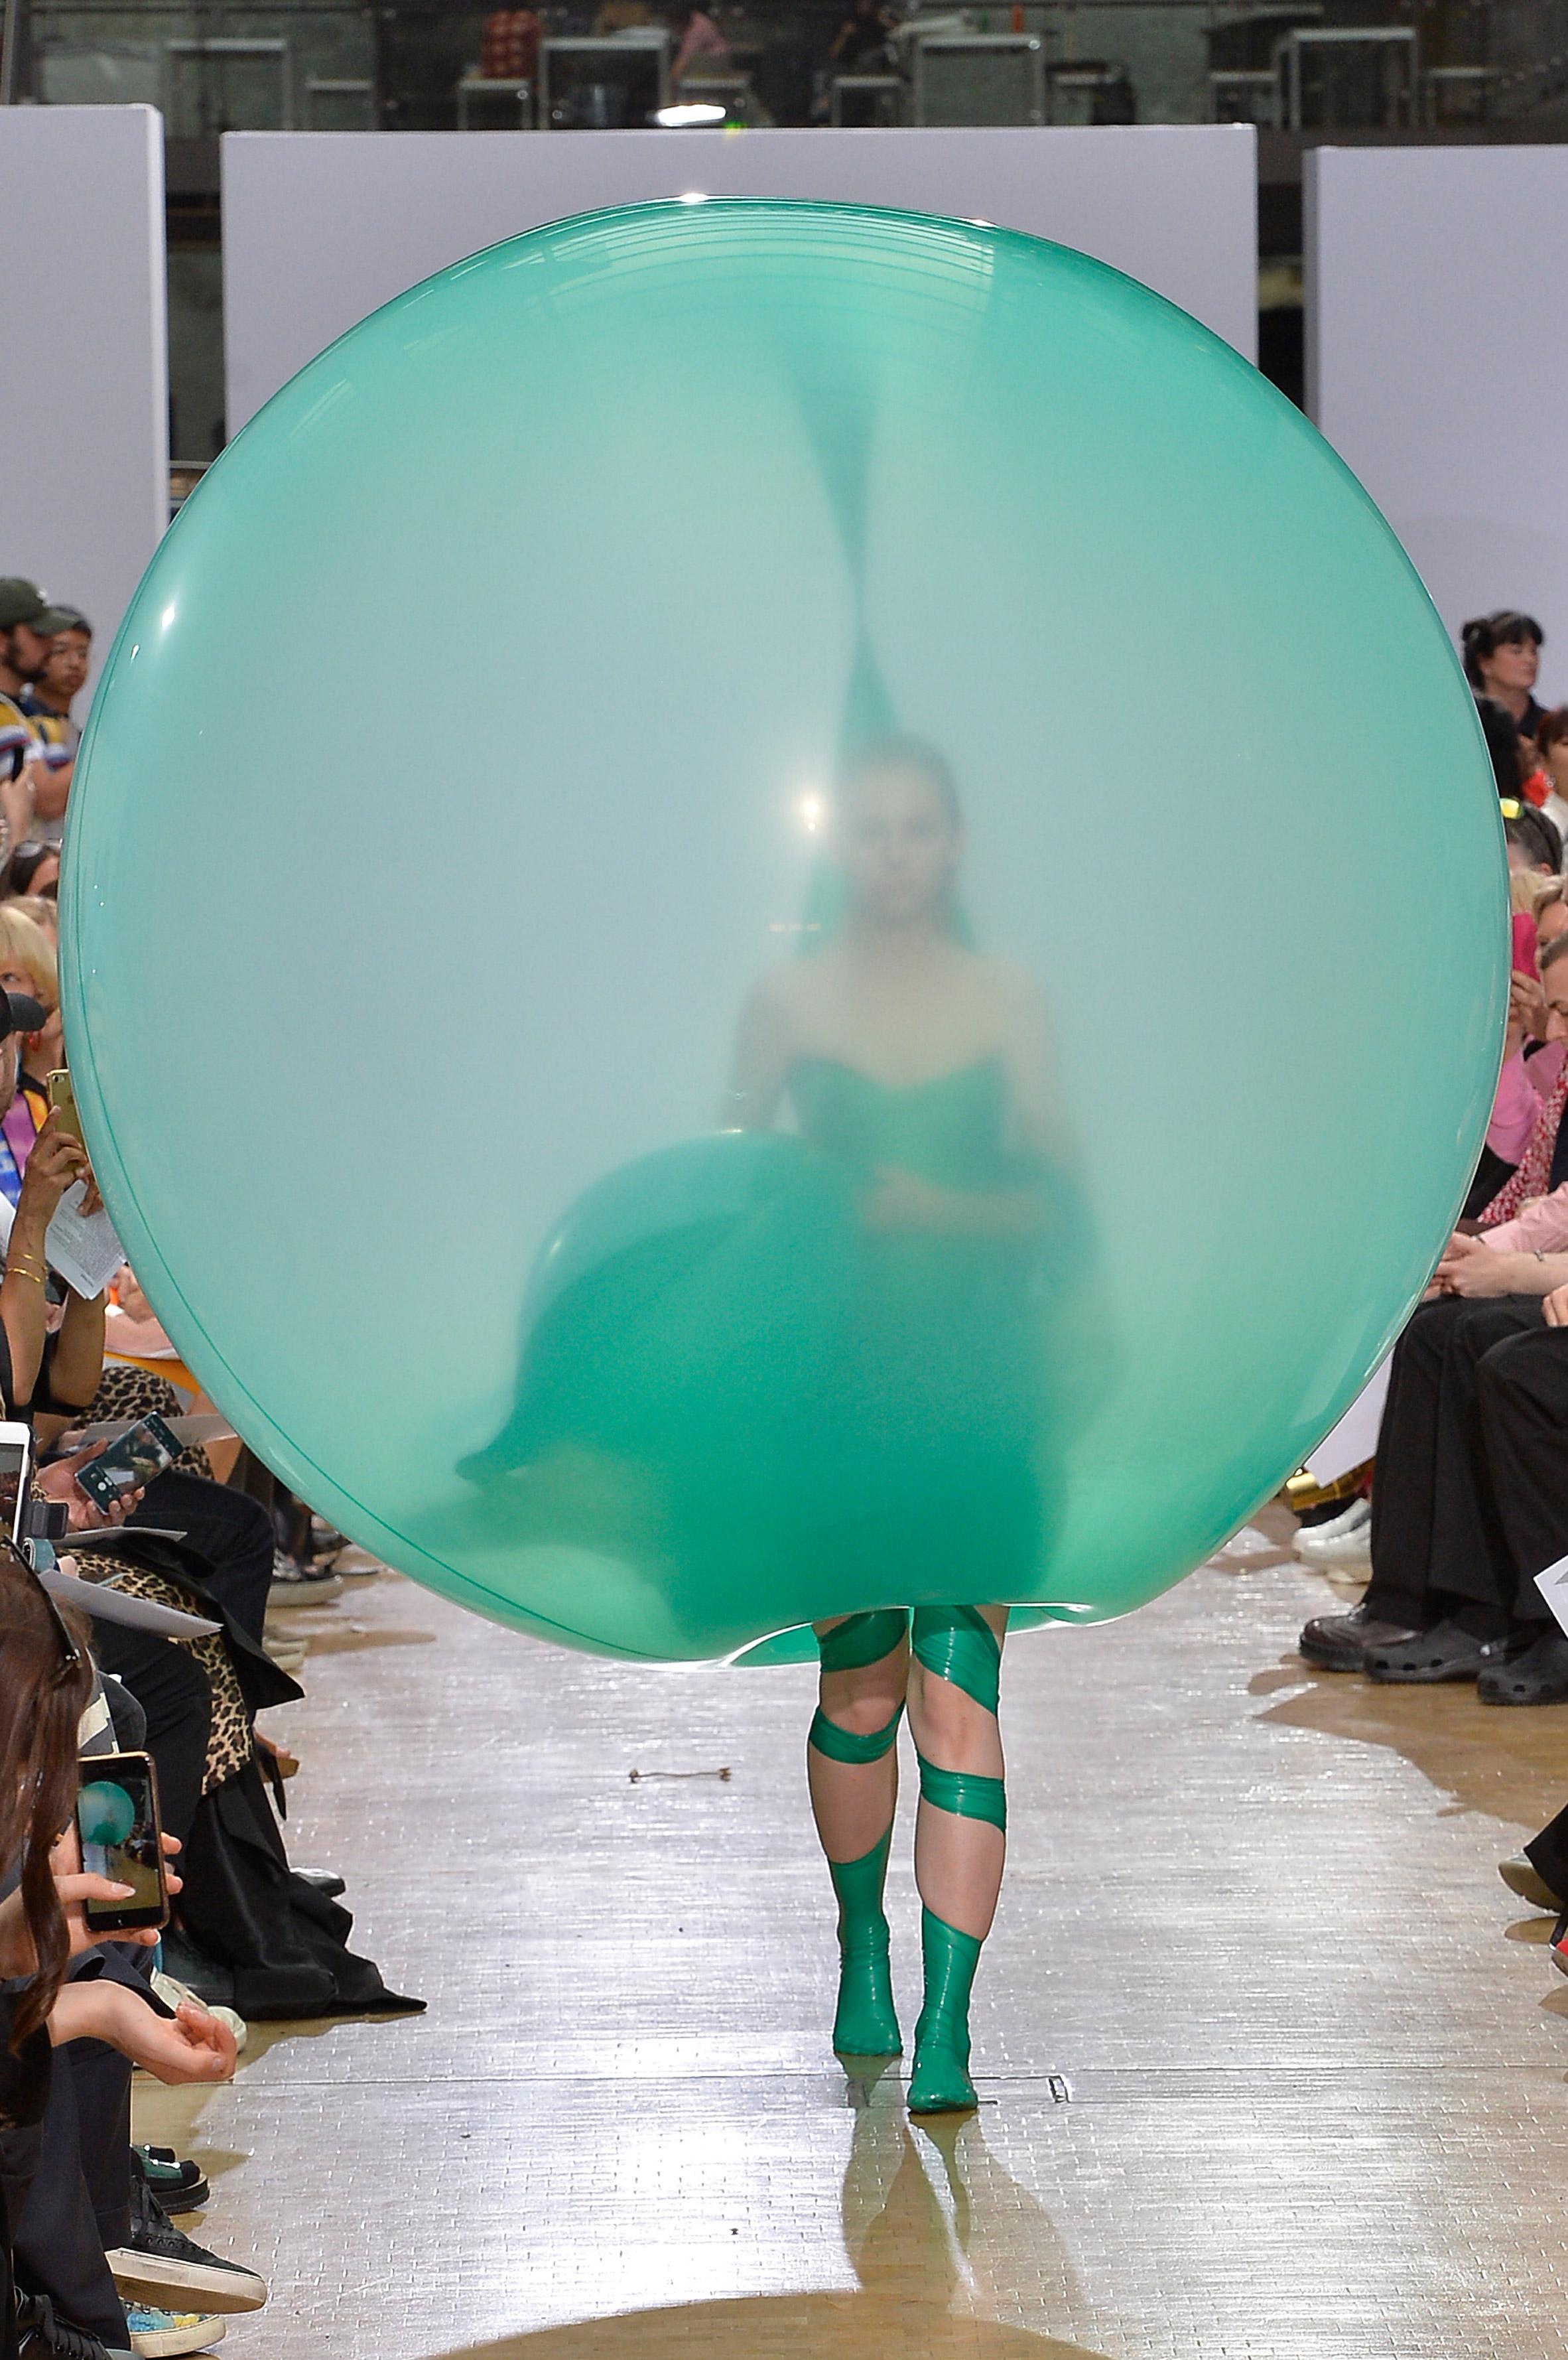 Fredrik Tjærandsen's rubber bubble clothing